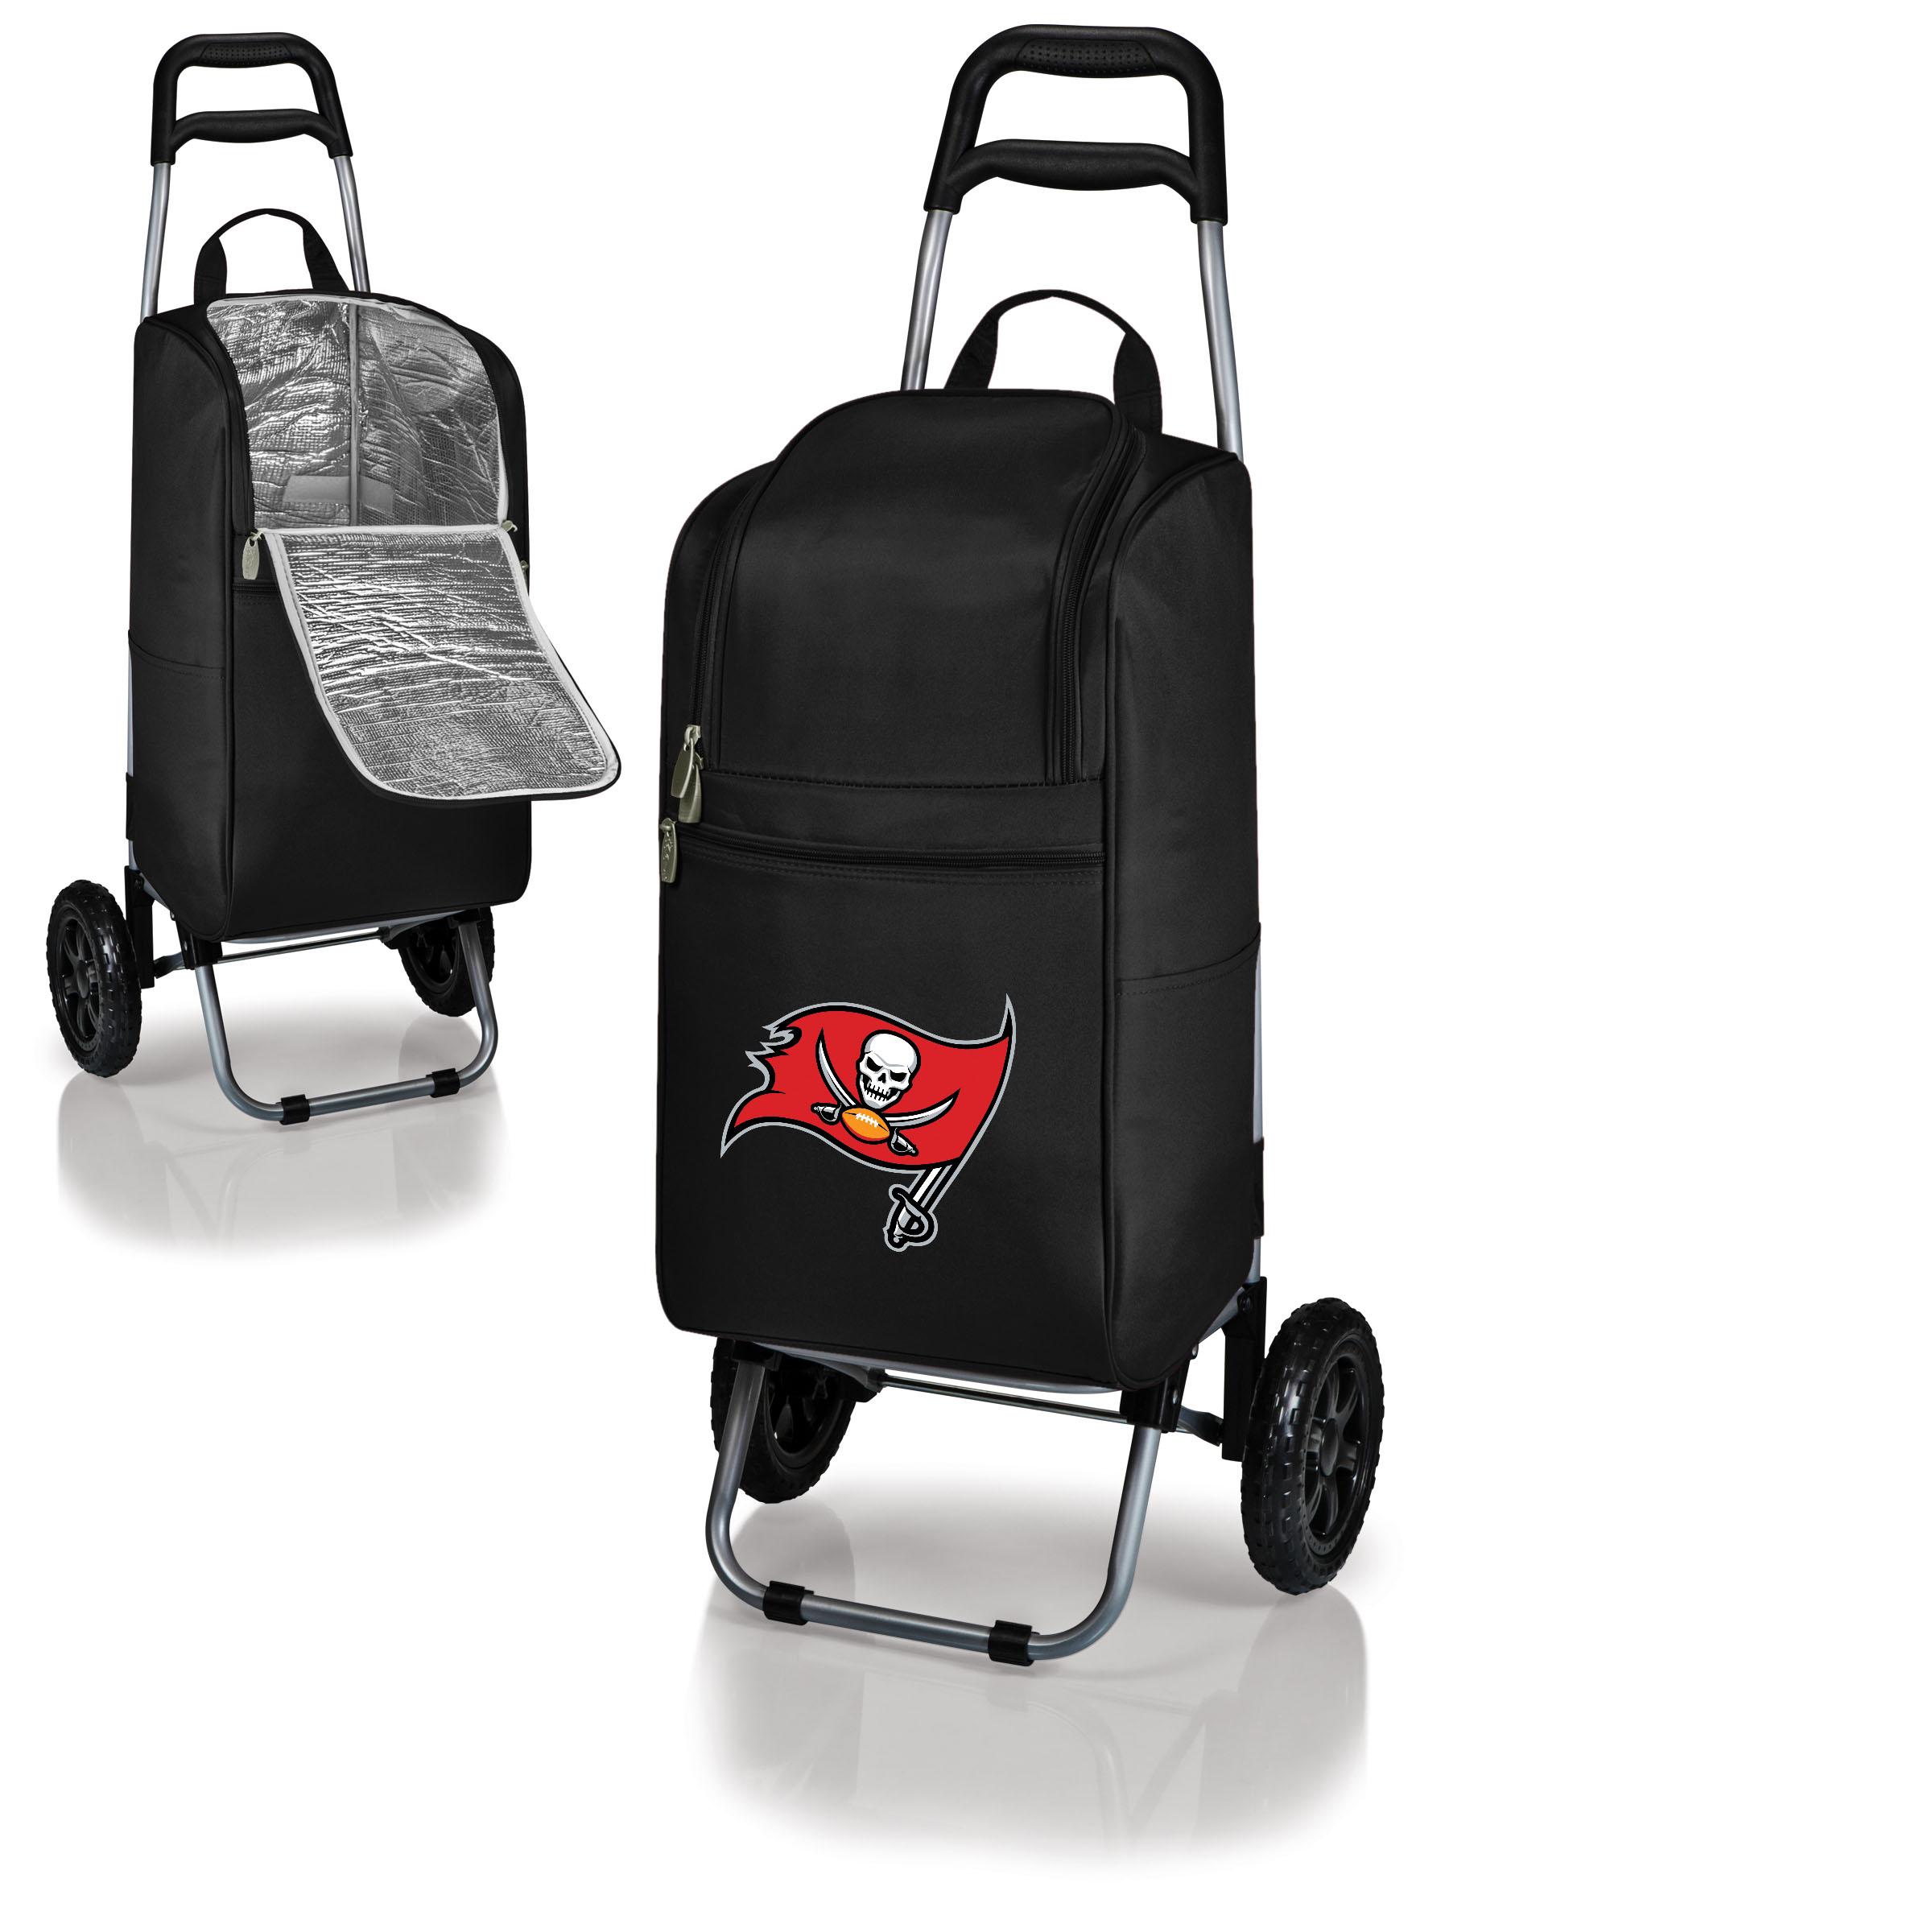 Tampa Bay Buccaneers Cart Cooler - Black - - No Size